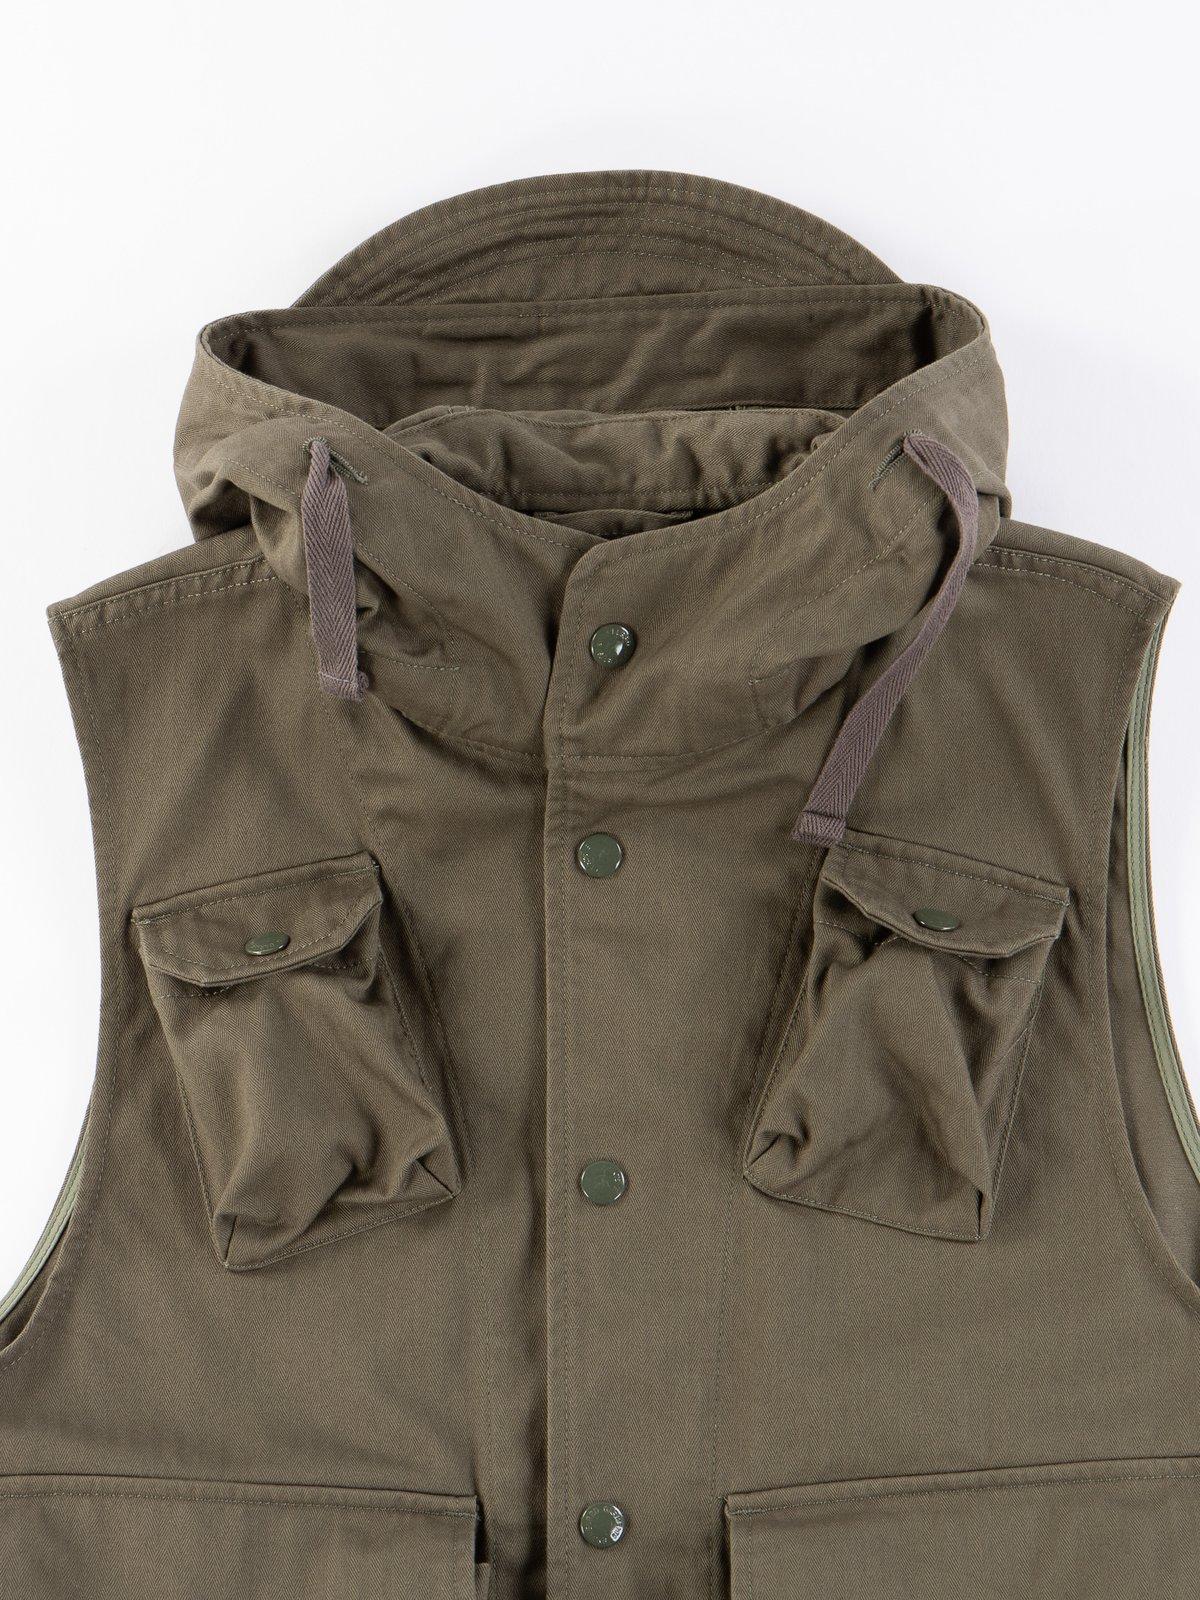 Olive Cotton Herringbone Twill Field Vest - Image 3